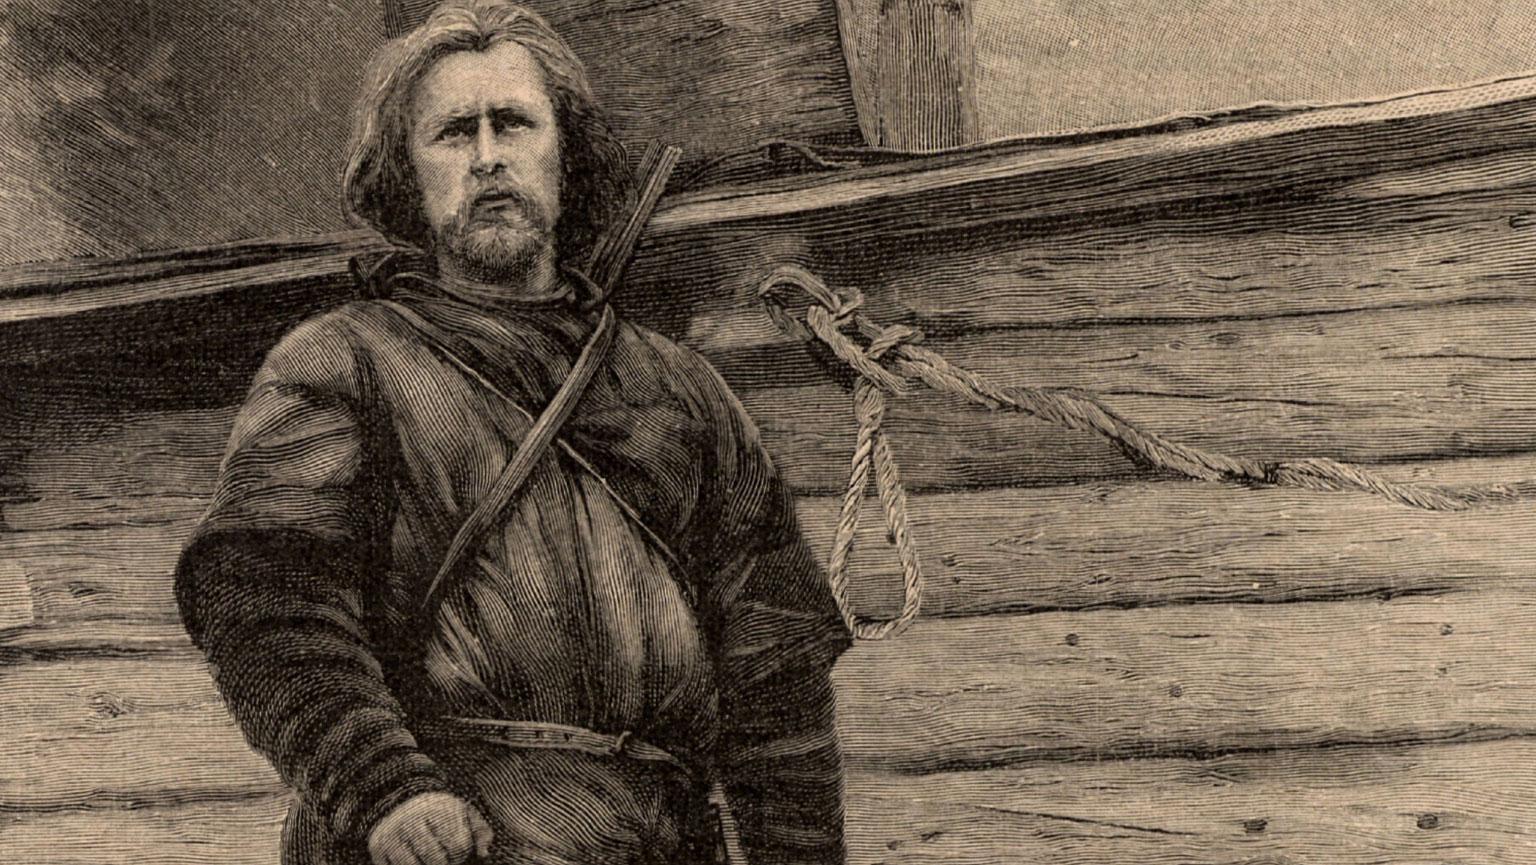 The Saga of Arctic Exploration